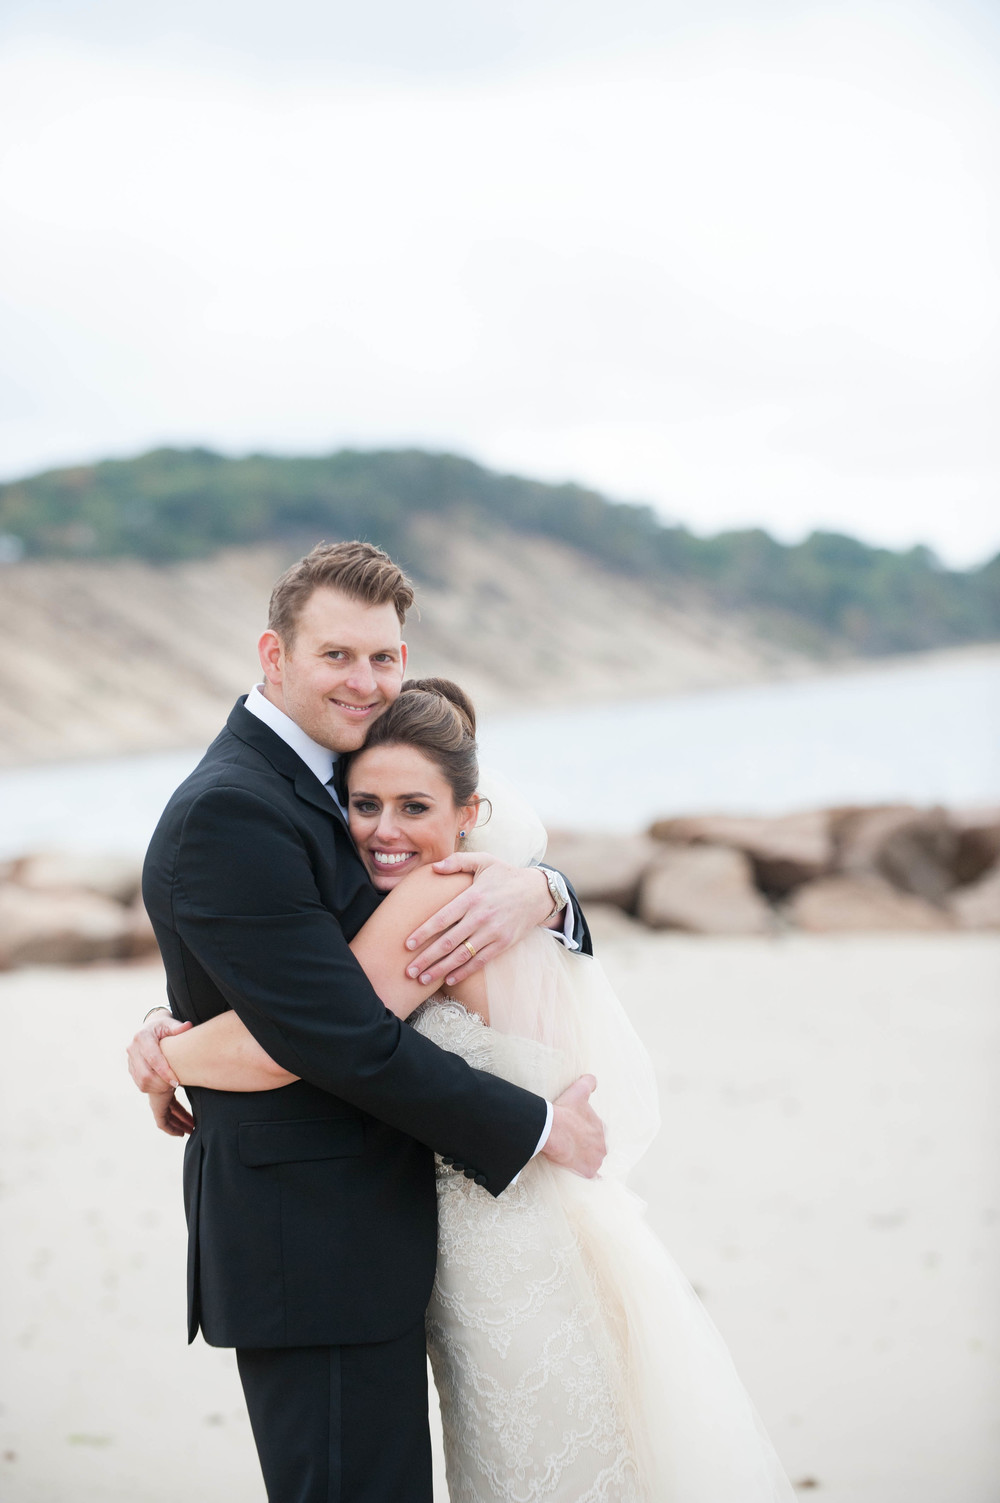 White_Cliffs_Plymouth_Wedding-31.jpg